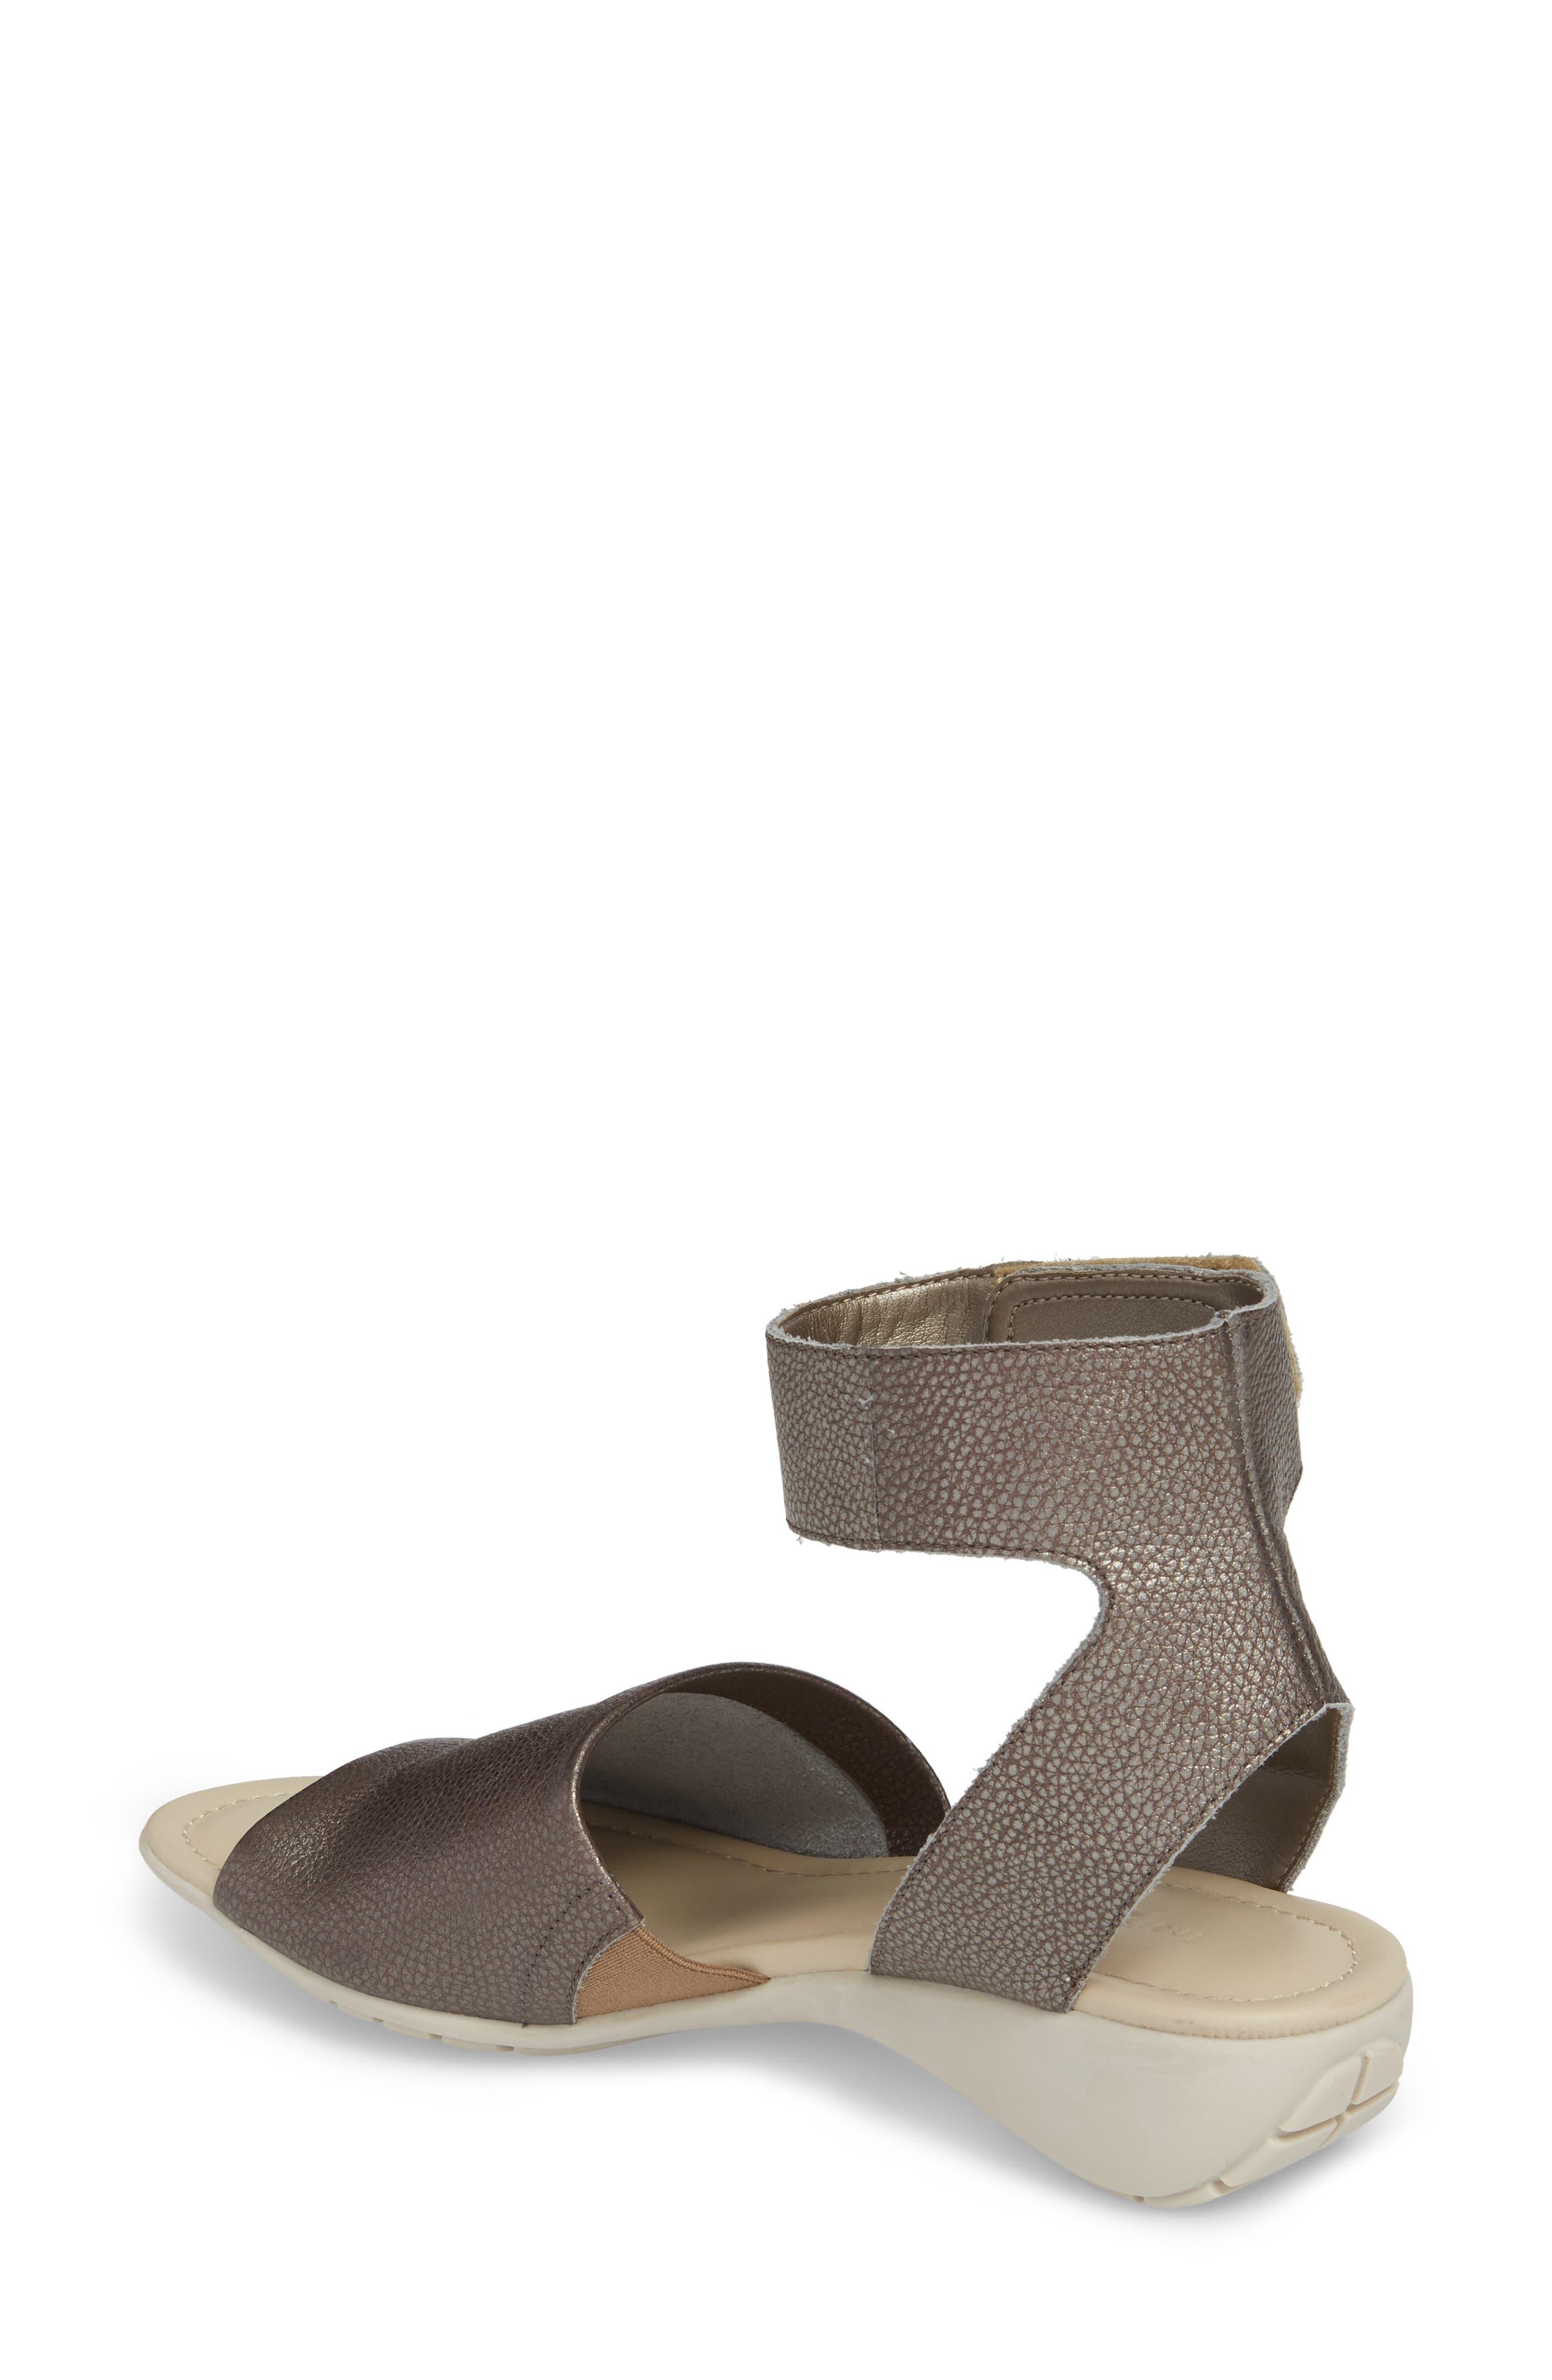 be7ff631cba5 Women s The FLEXX Sandals